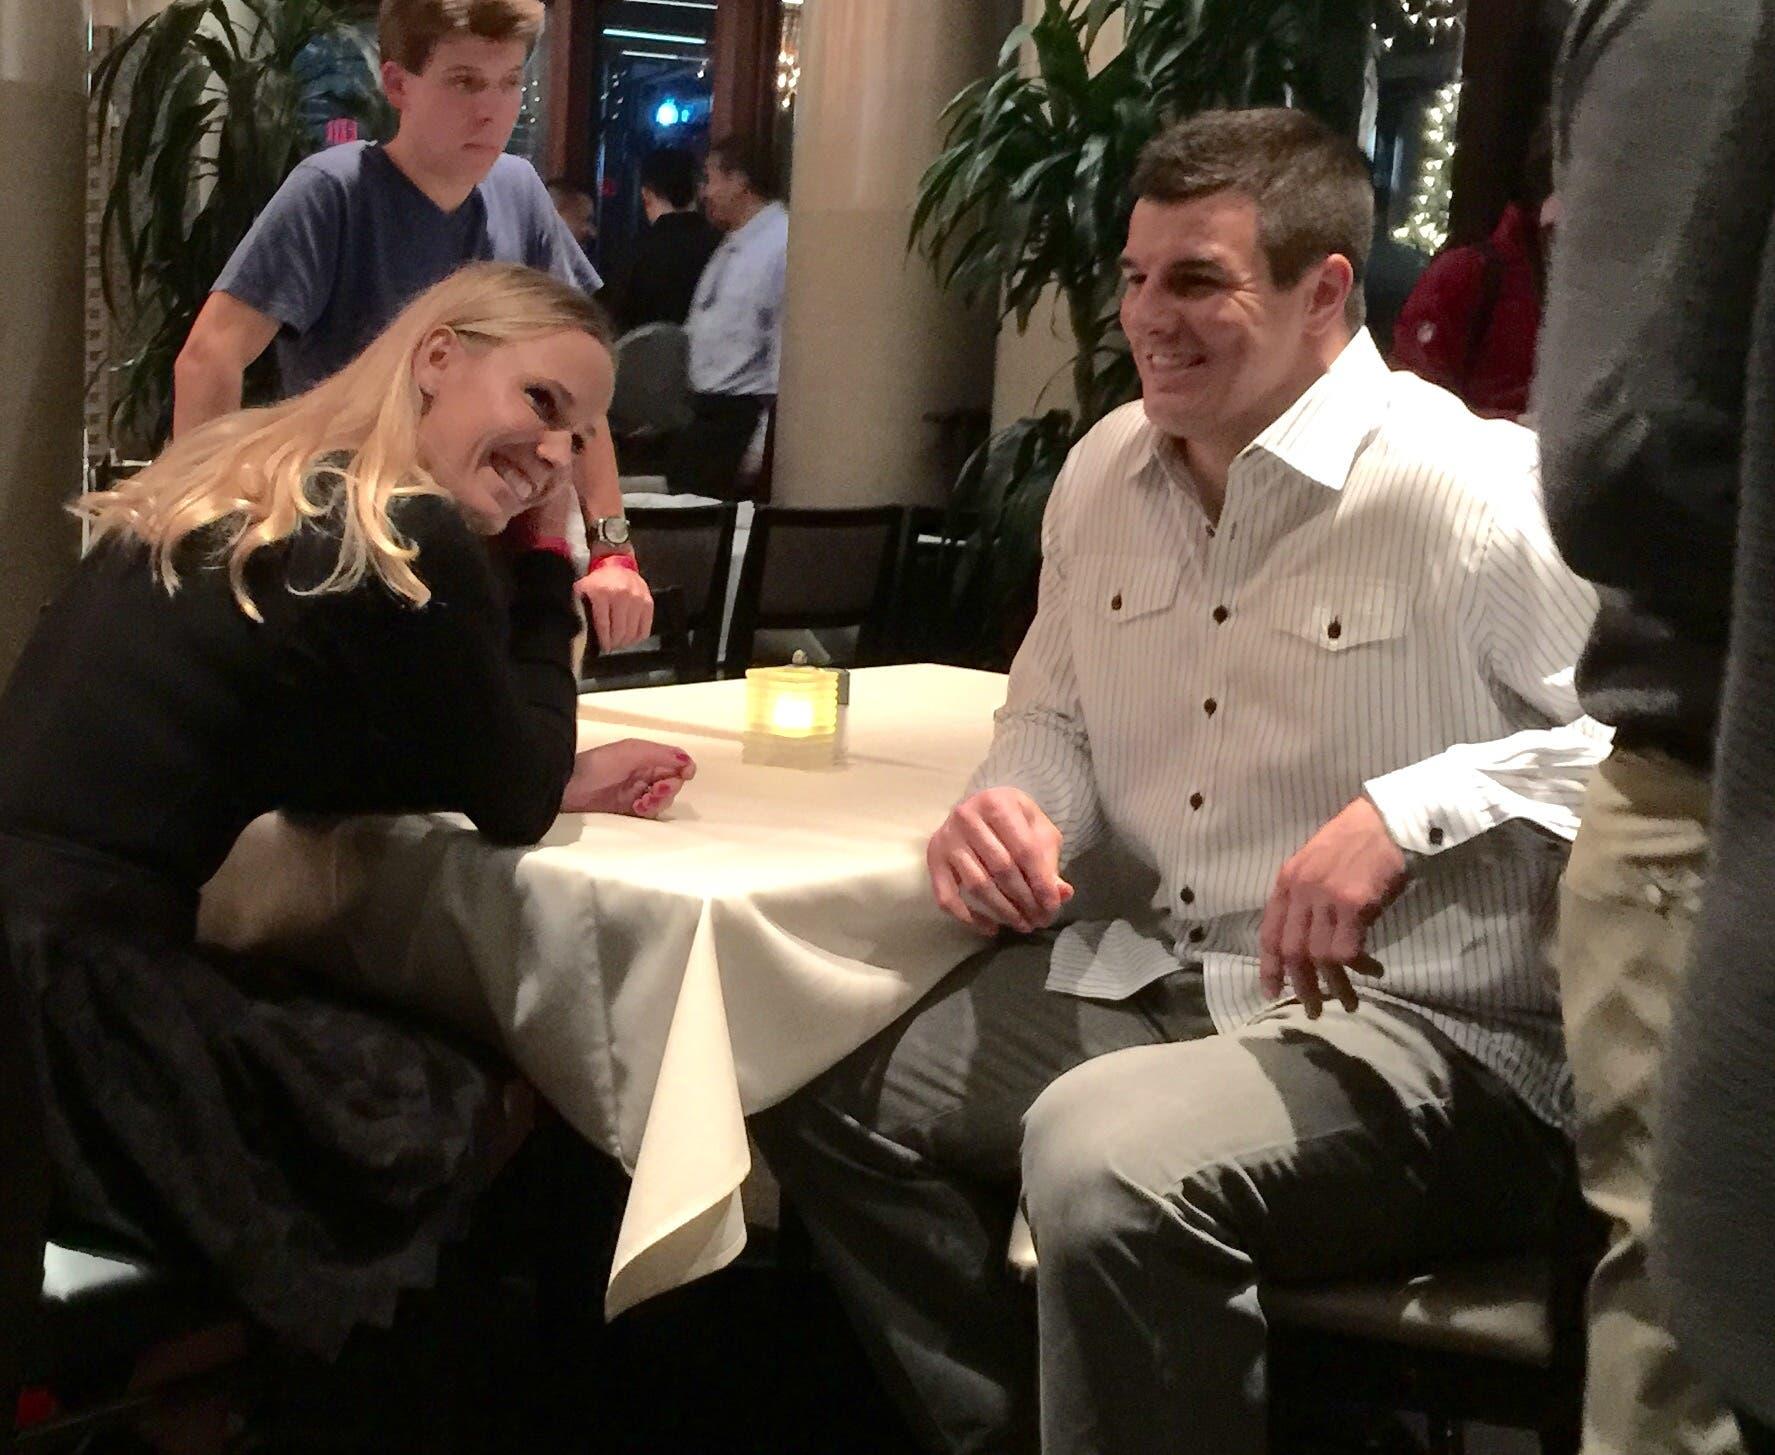 Caroline Wozniacki e Ryan Kerrigan ad un evento di beneficenza a Washington D.C